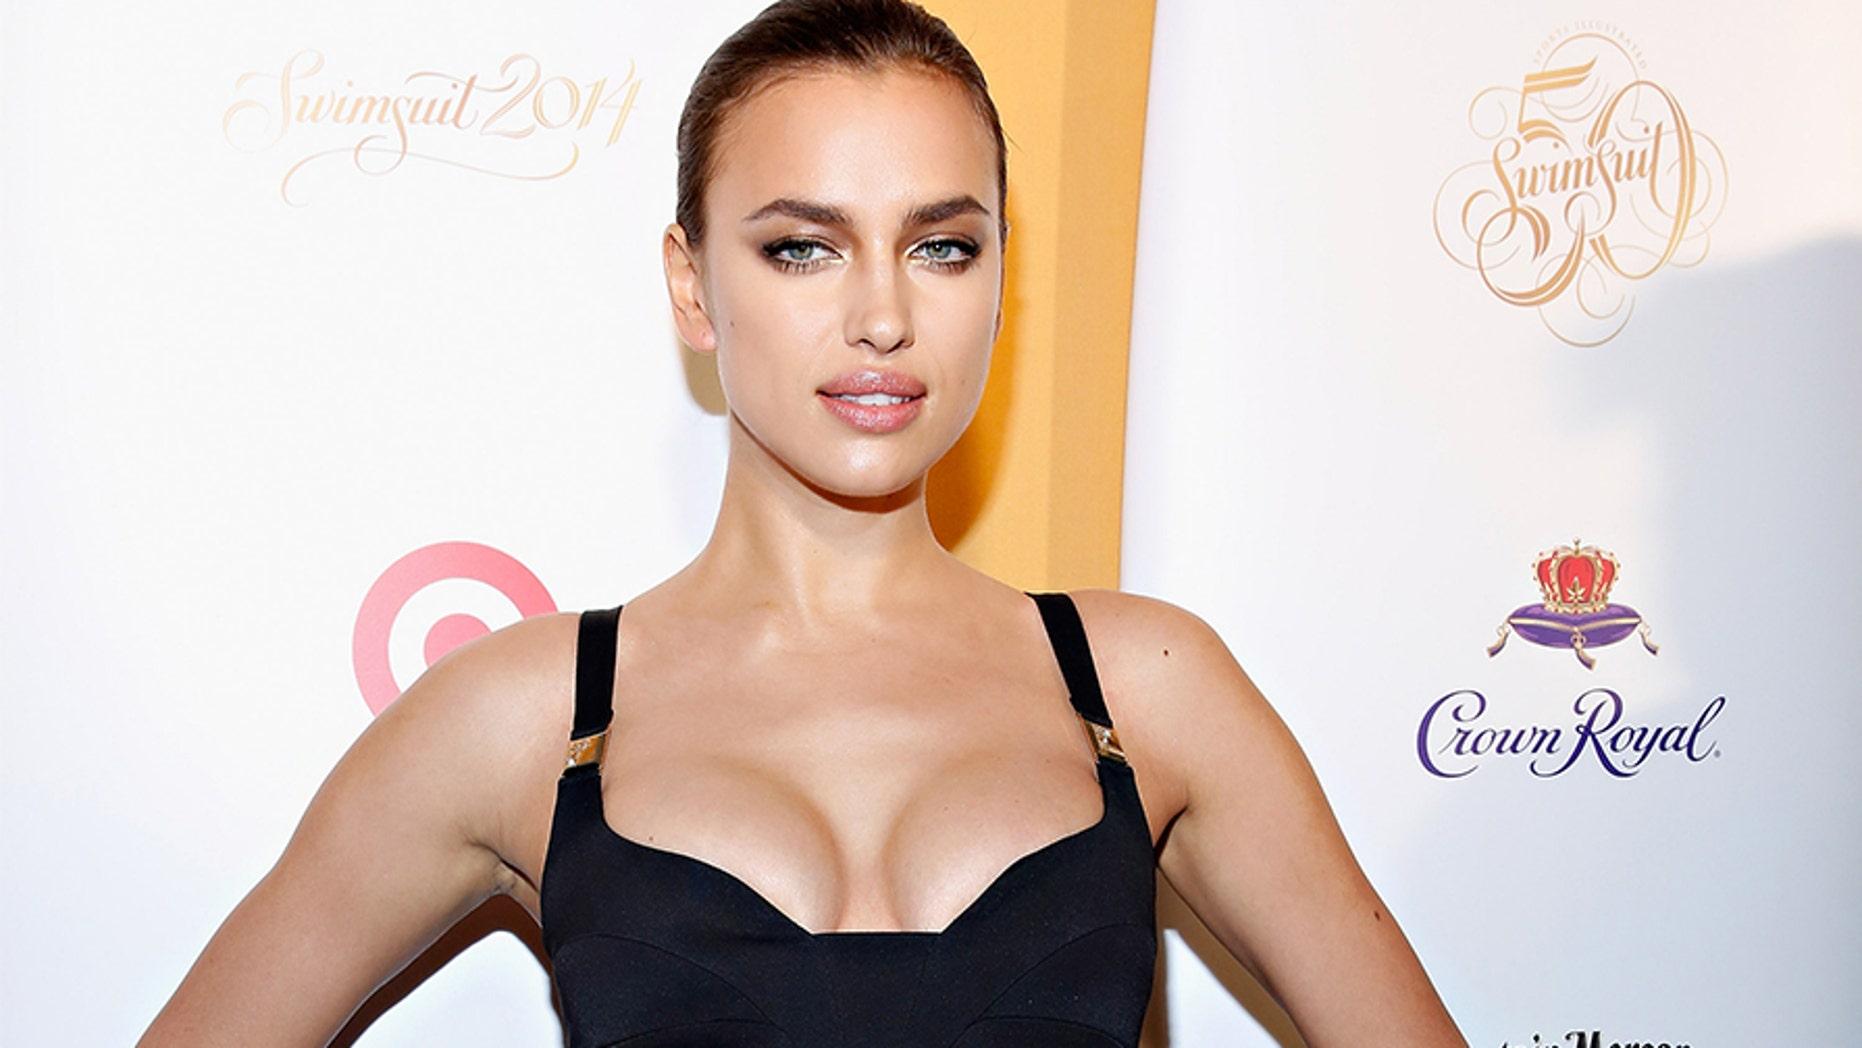 Supermodel Irina Shayk Bradley Coopers Girlfriend Unveils Her